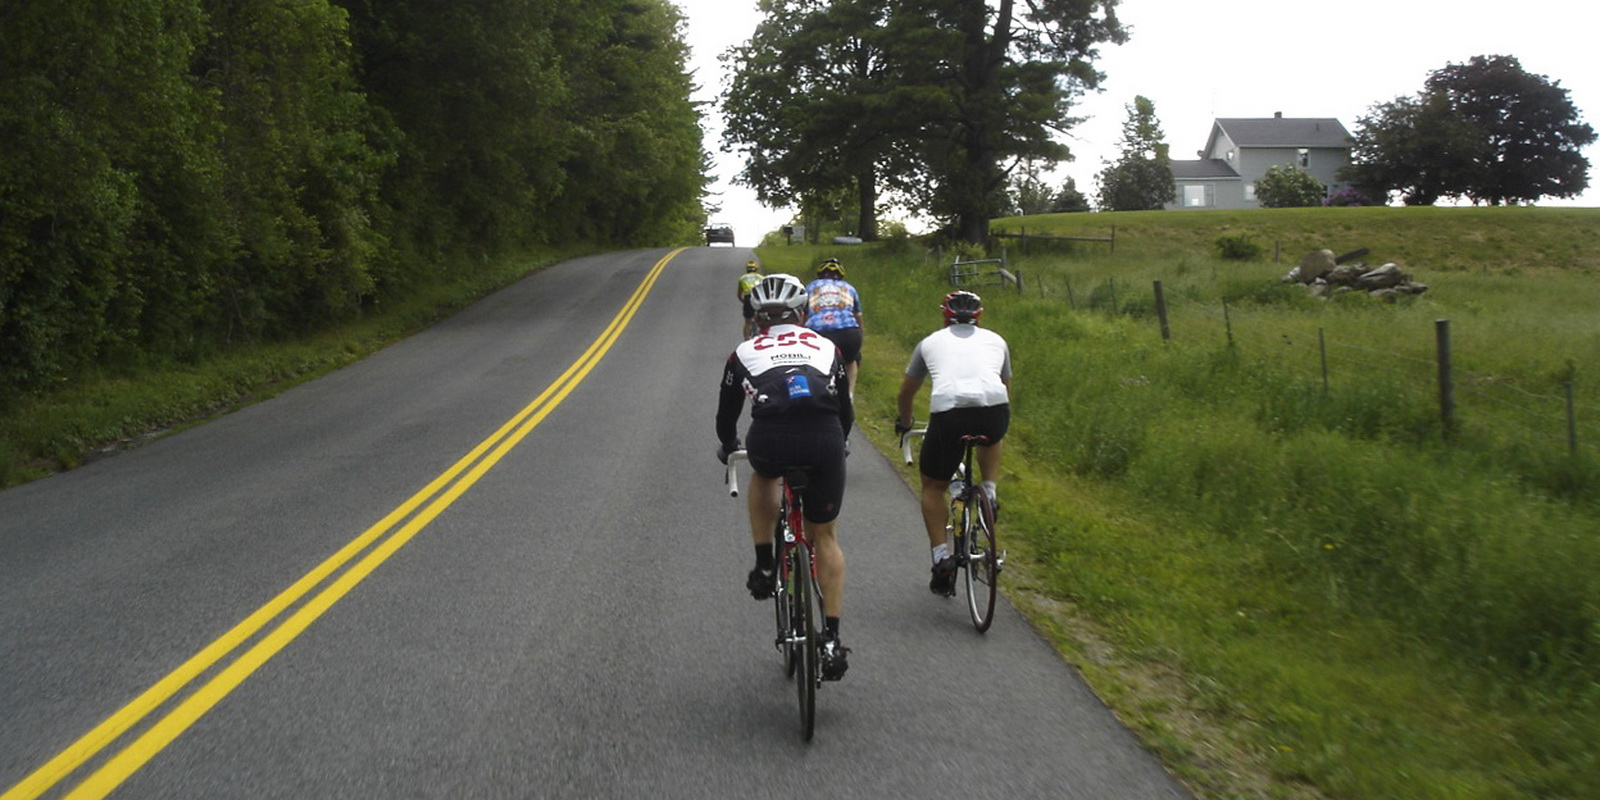 Western Massachusetts Events: Alford, Massachusetts Cycling